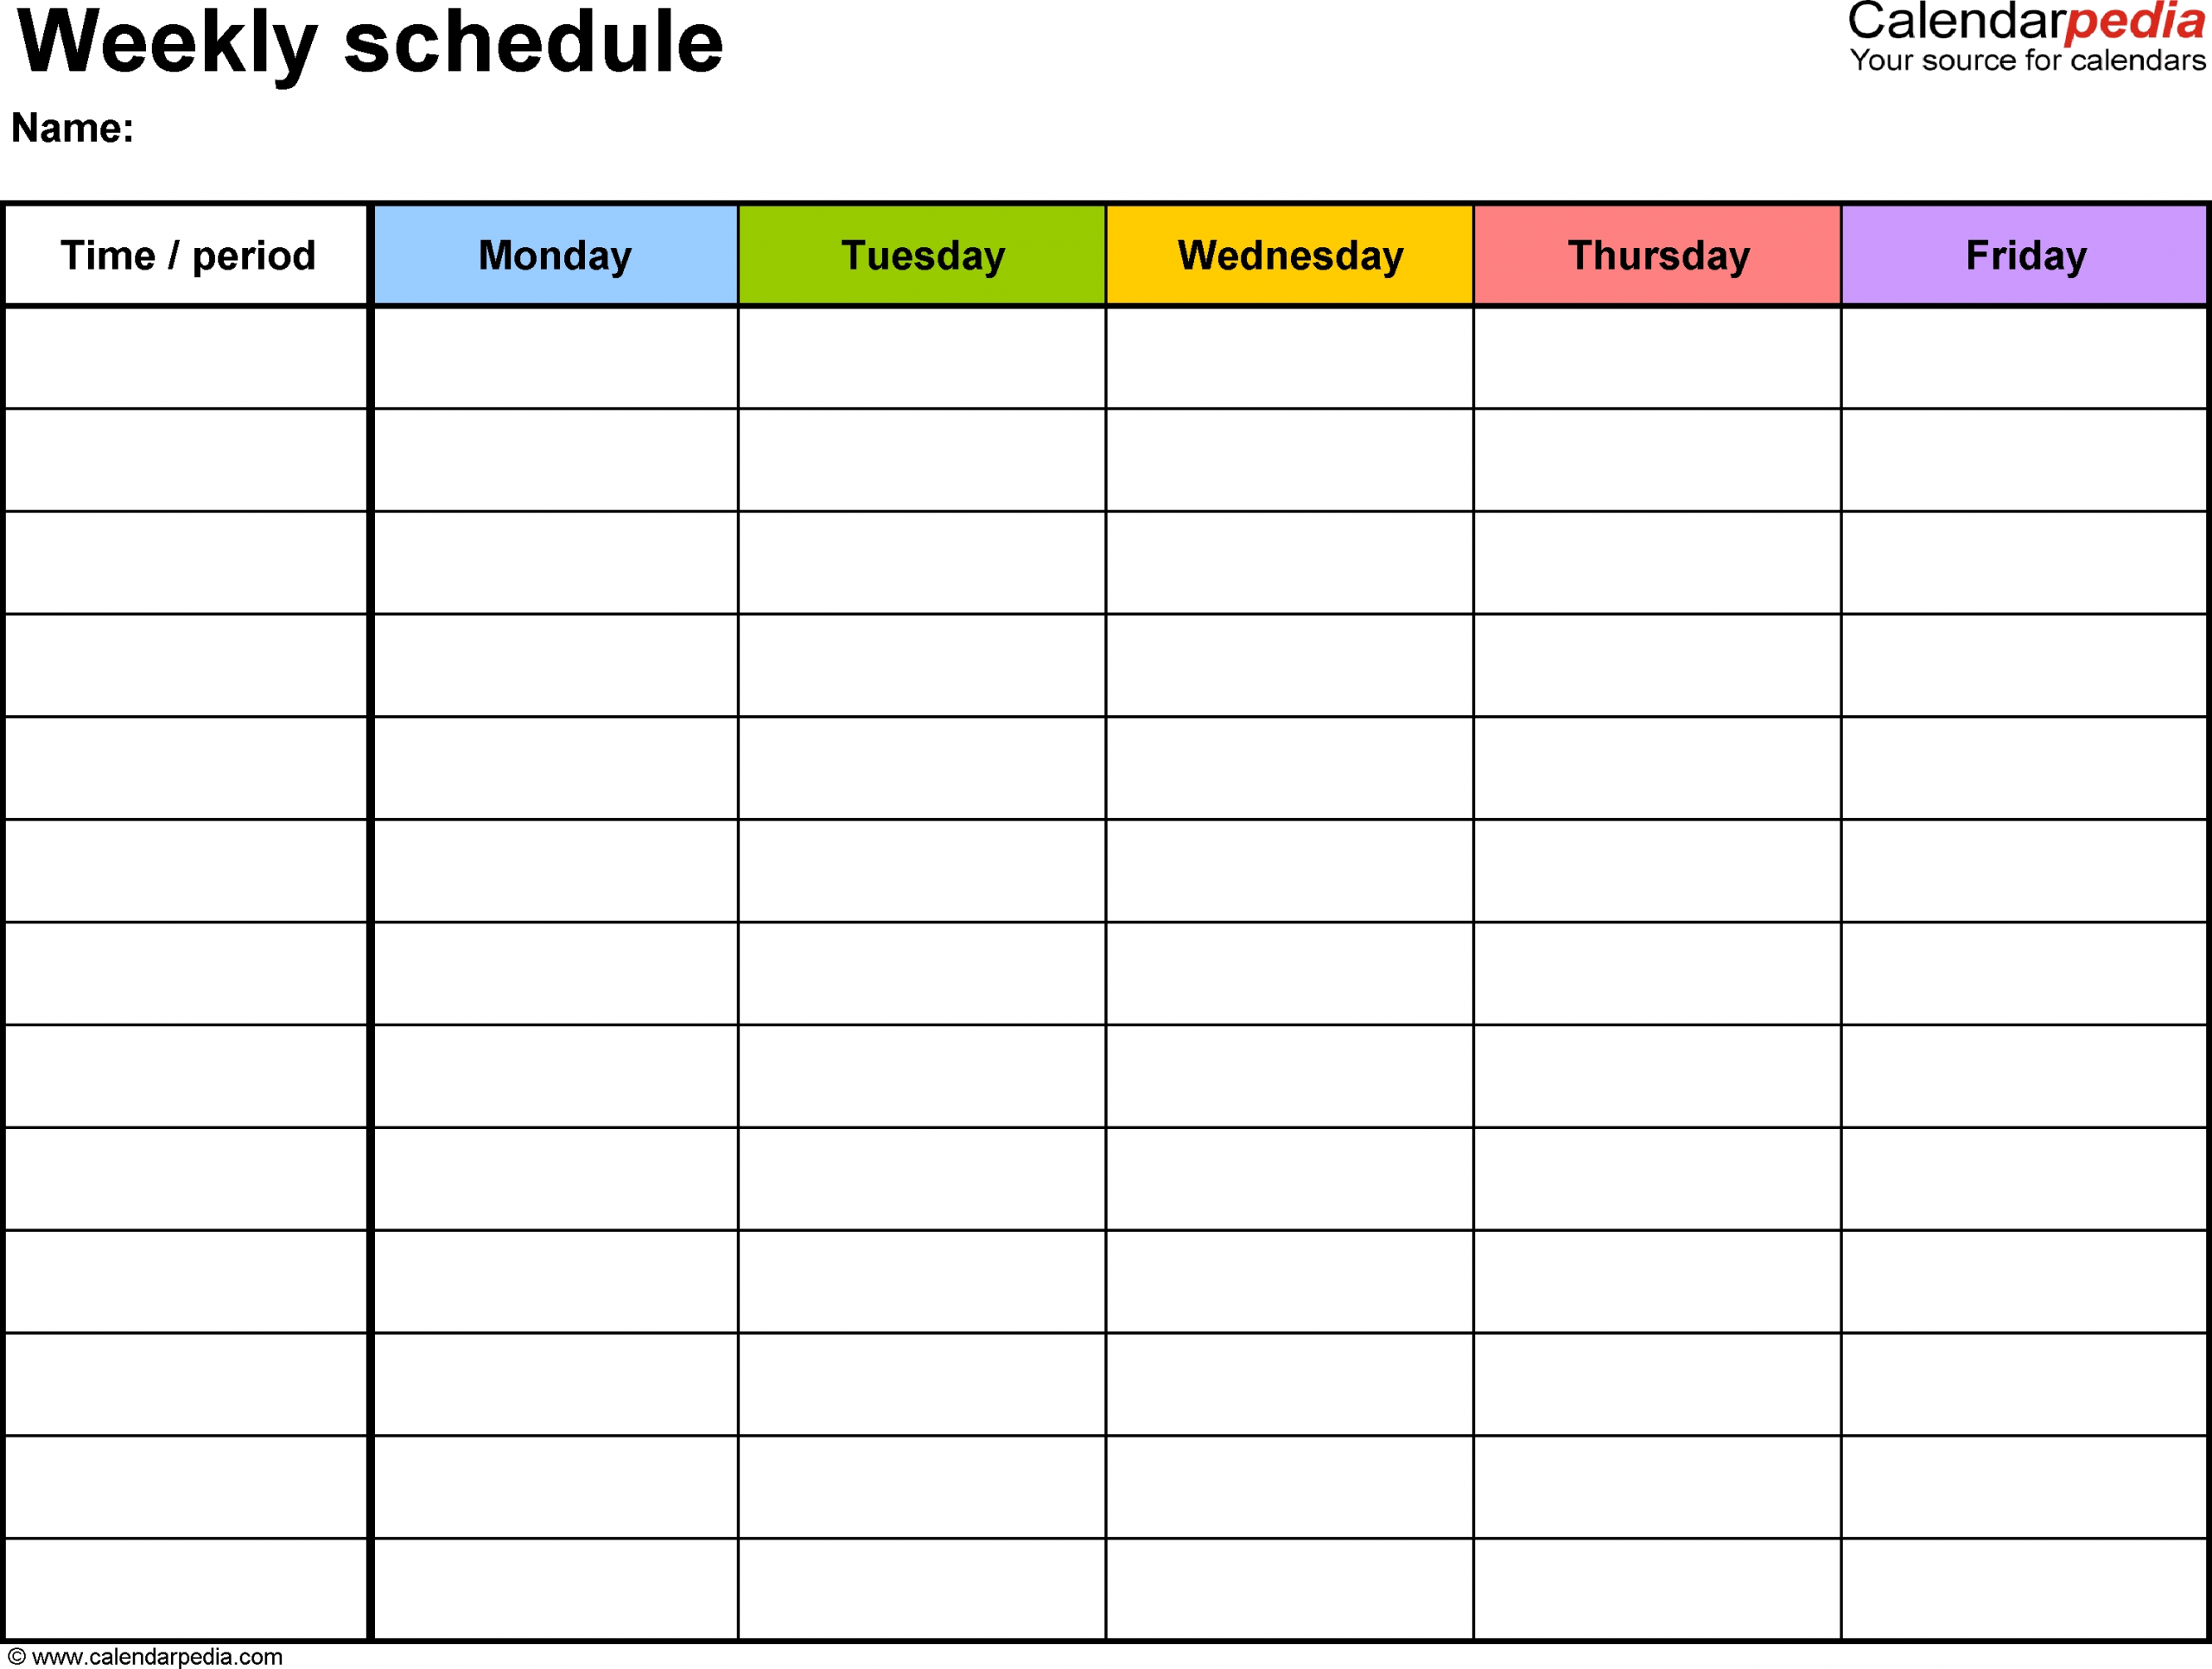 Free Calendars Monday To Sunday - Calendar Inspiration Design Monday To Sunday Calendar Template Free